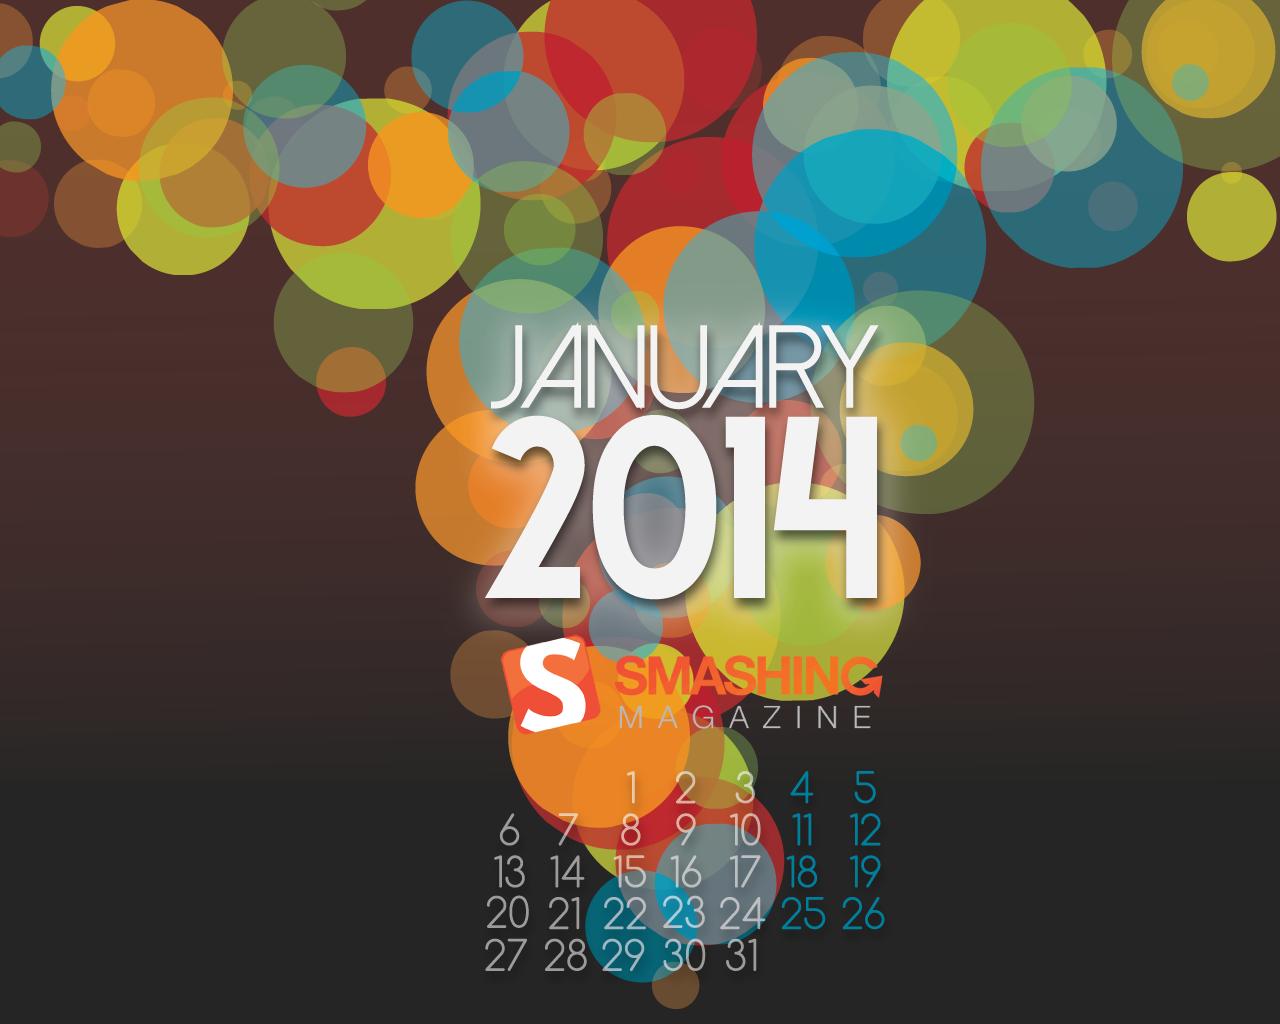 Desktop Wallpaper Calendars January 2014 Smashing Magazine 1280x1024